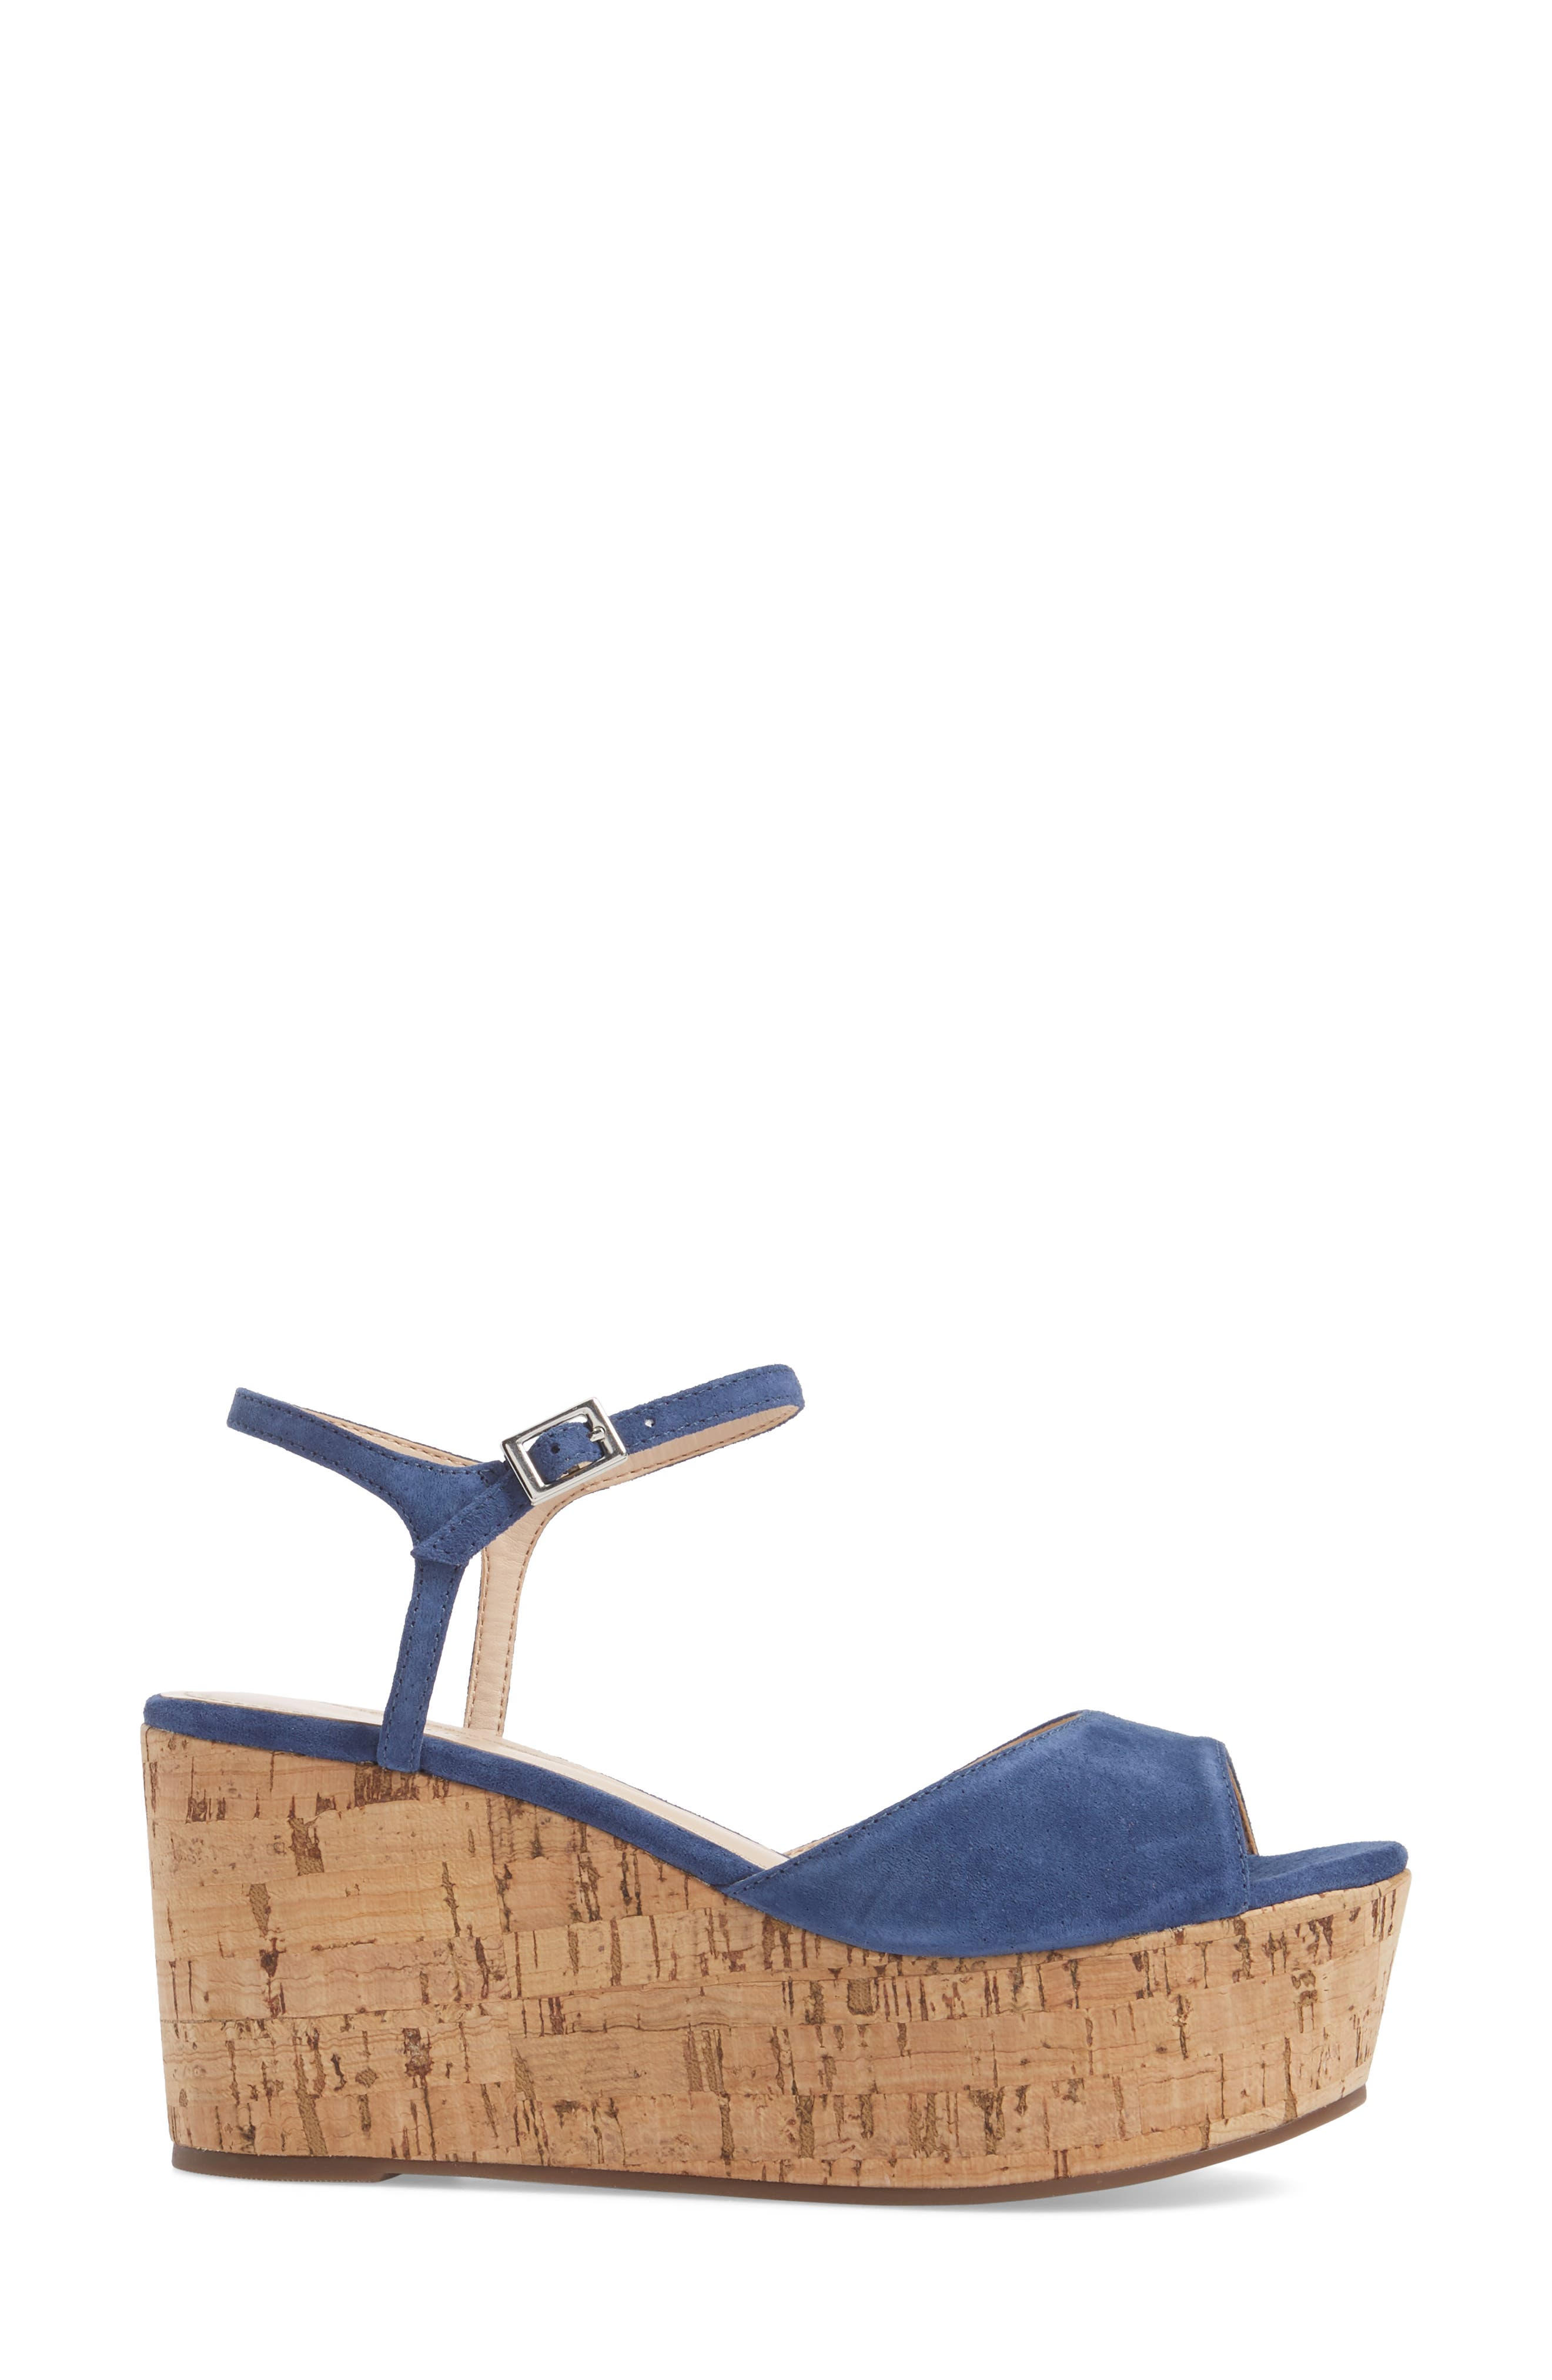 Heloise Platform Wedge Sandal,                             Alternate thumbnail 3, color,                             Dress Blue